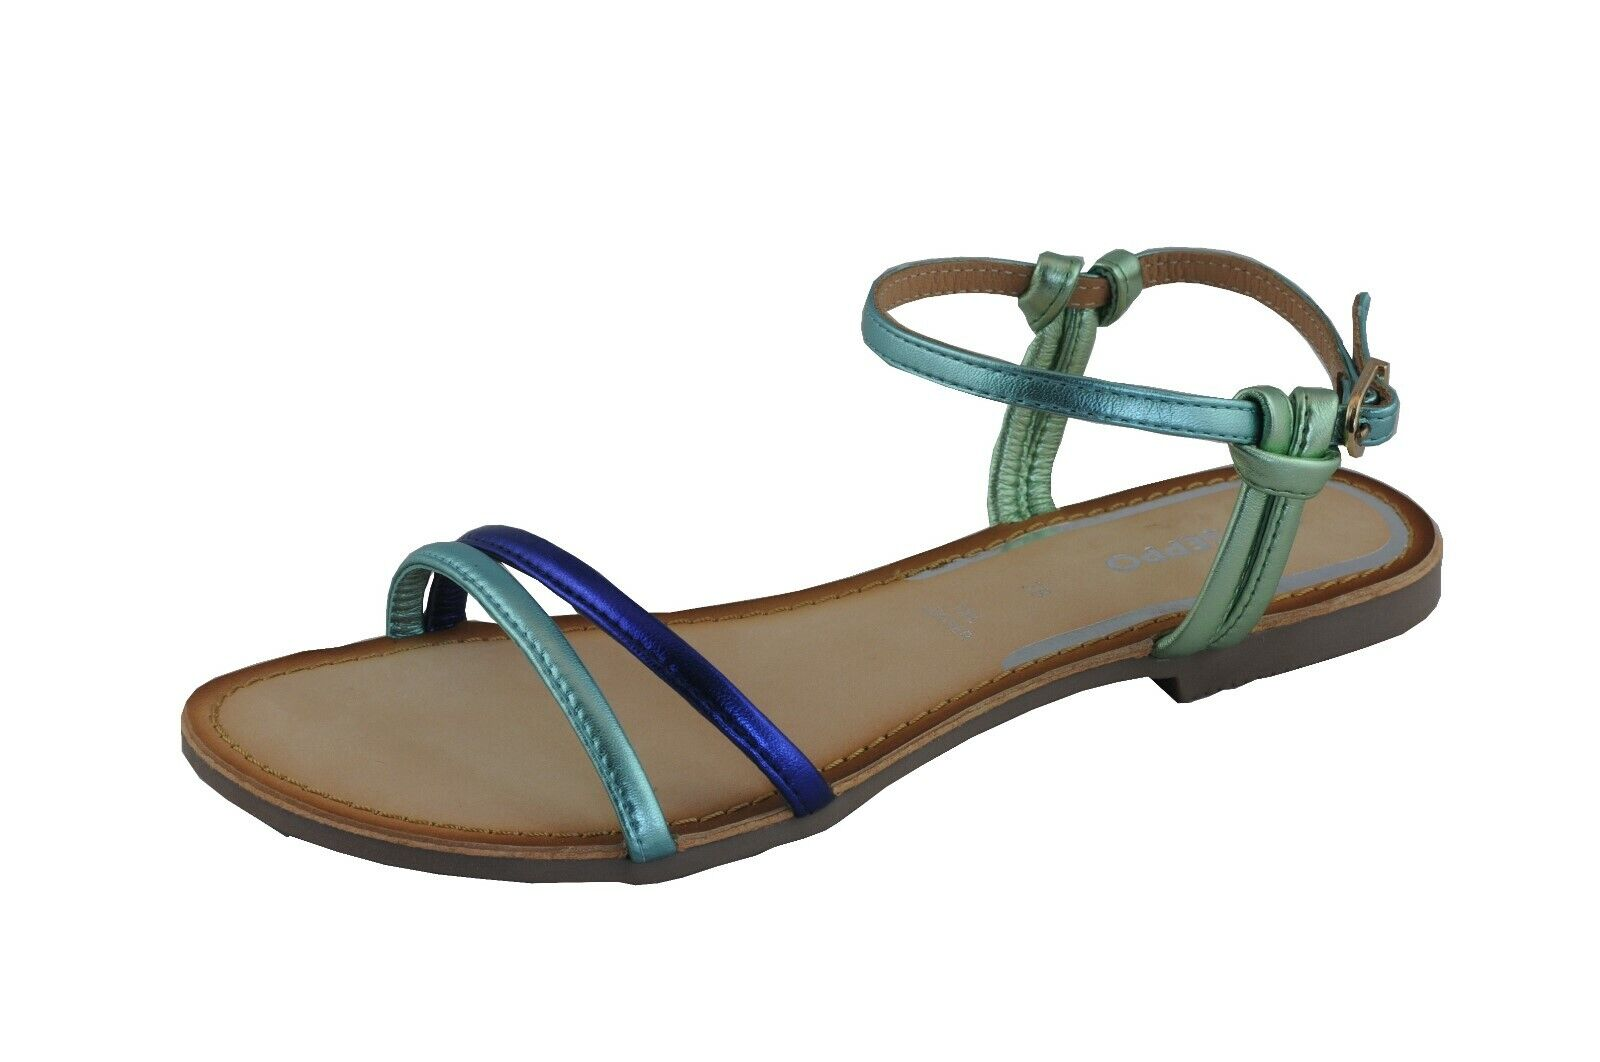 Gioseppo Sandale mujer Rieti Rieti Rieti 48217 verde-azul en Cuir D'Agneau Douazulre en Cuir 145adb